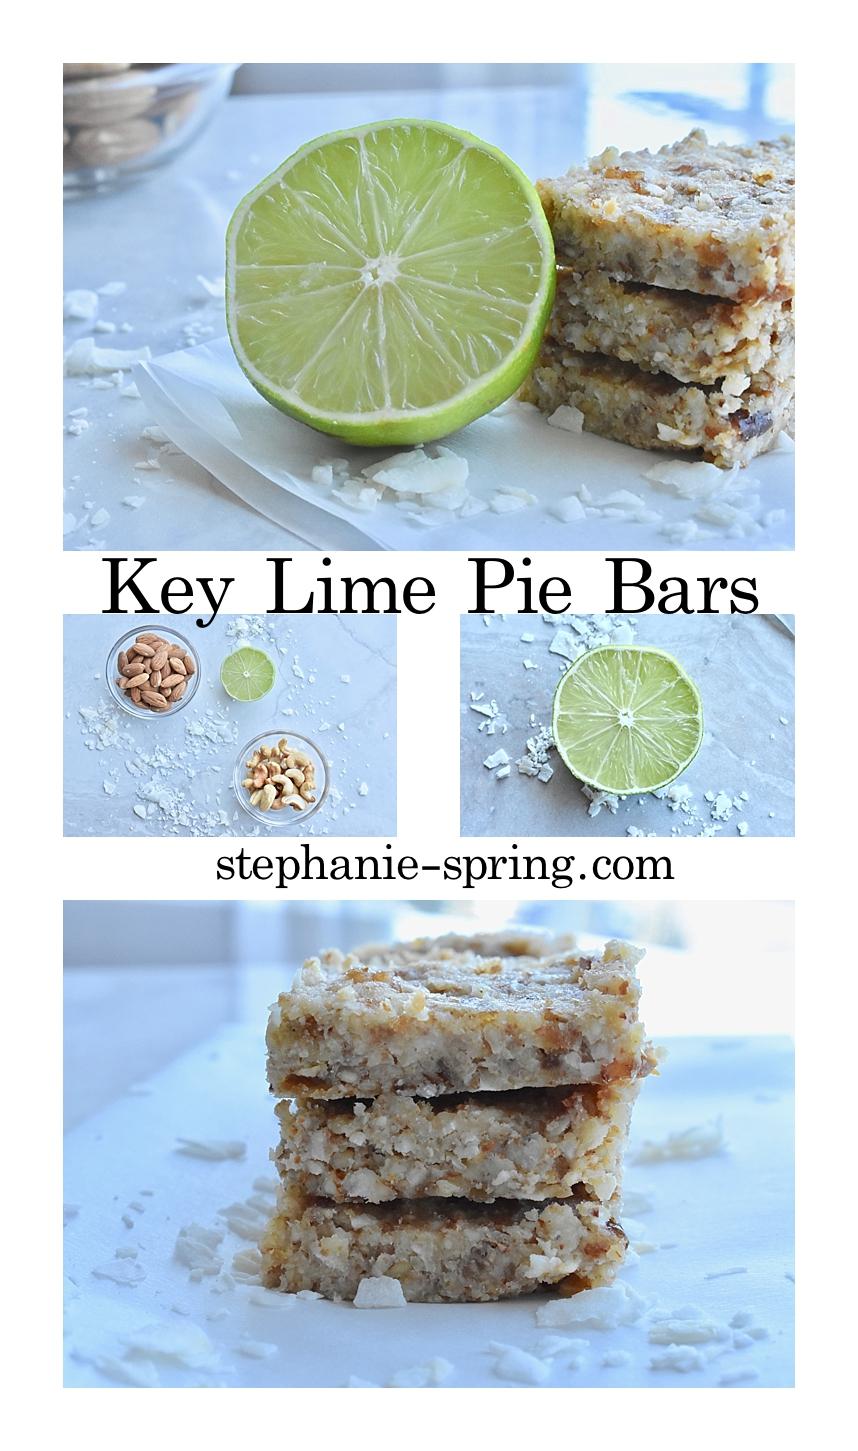 Key Lime Pie Bars--Recipe at: stephanie-spring.com